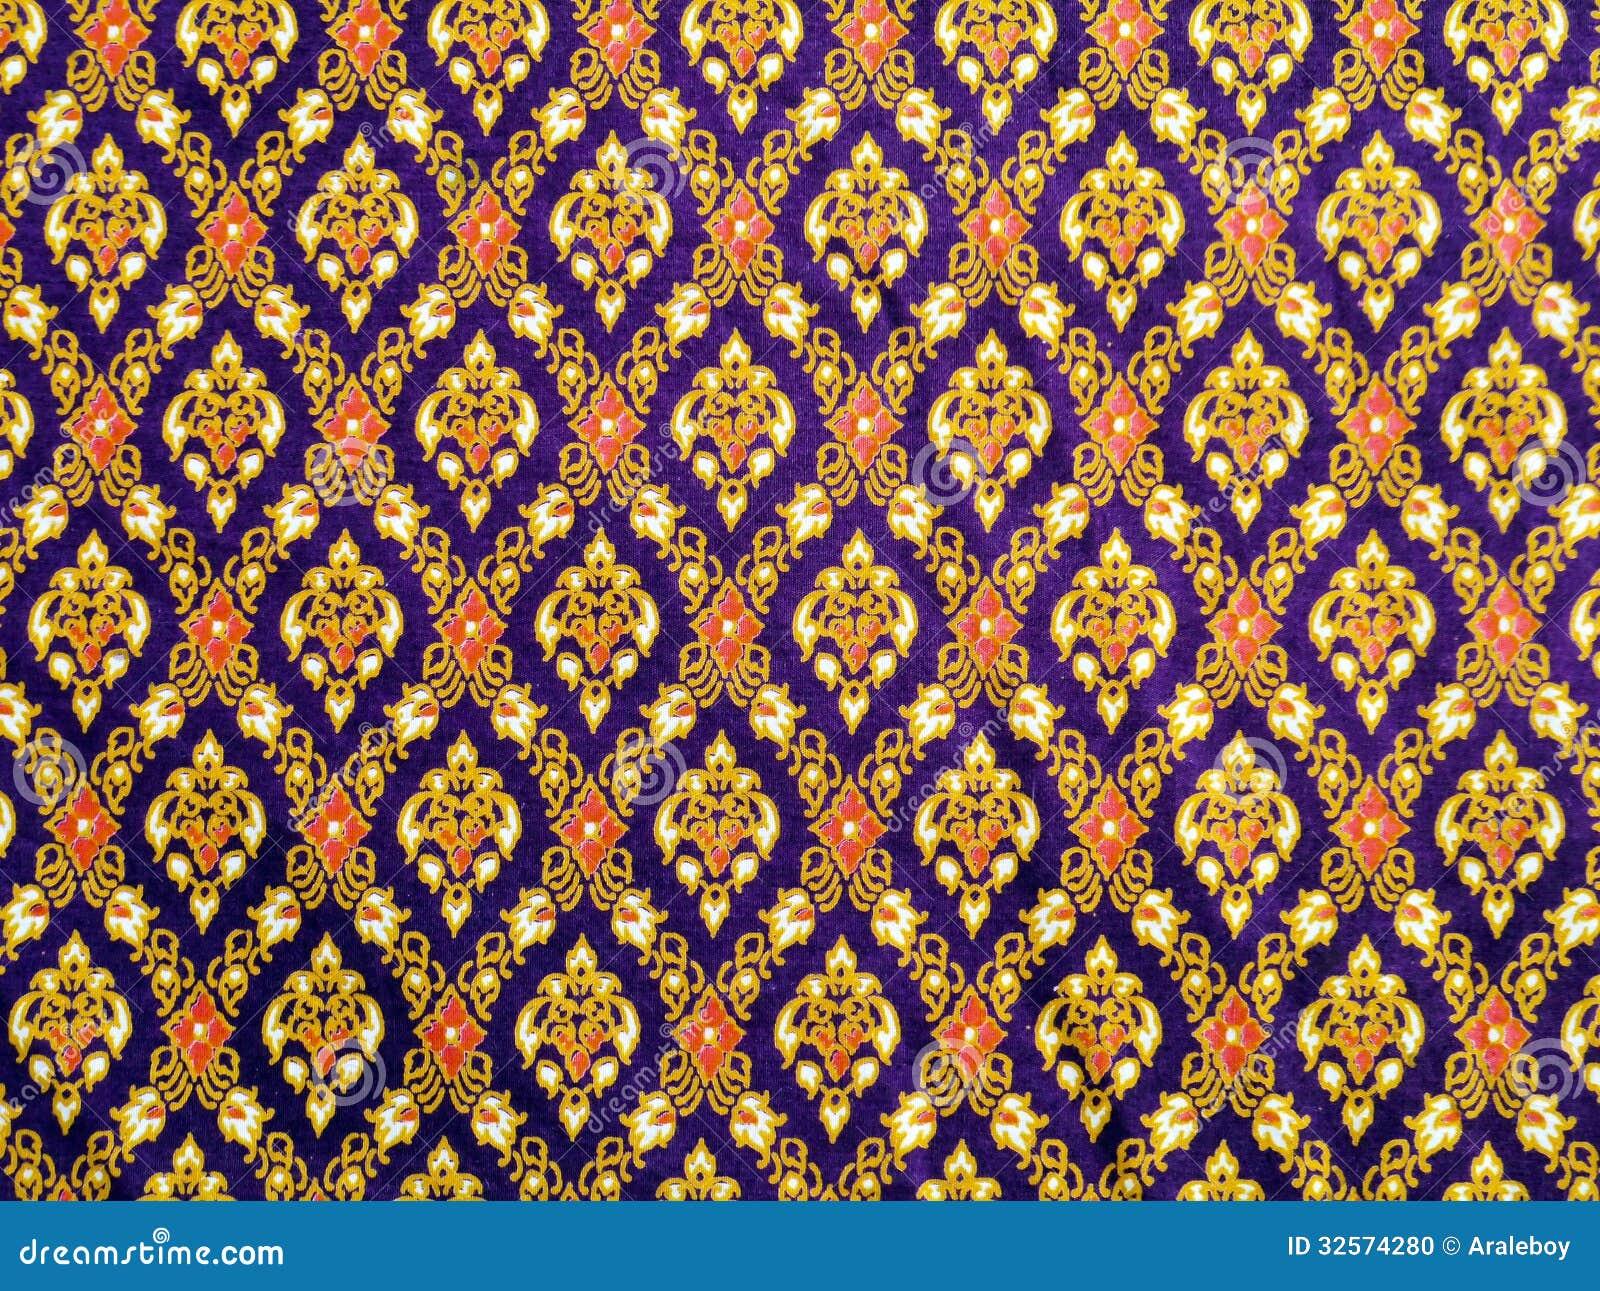 Galerry kid cloth wholesale thailand